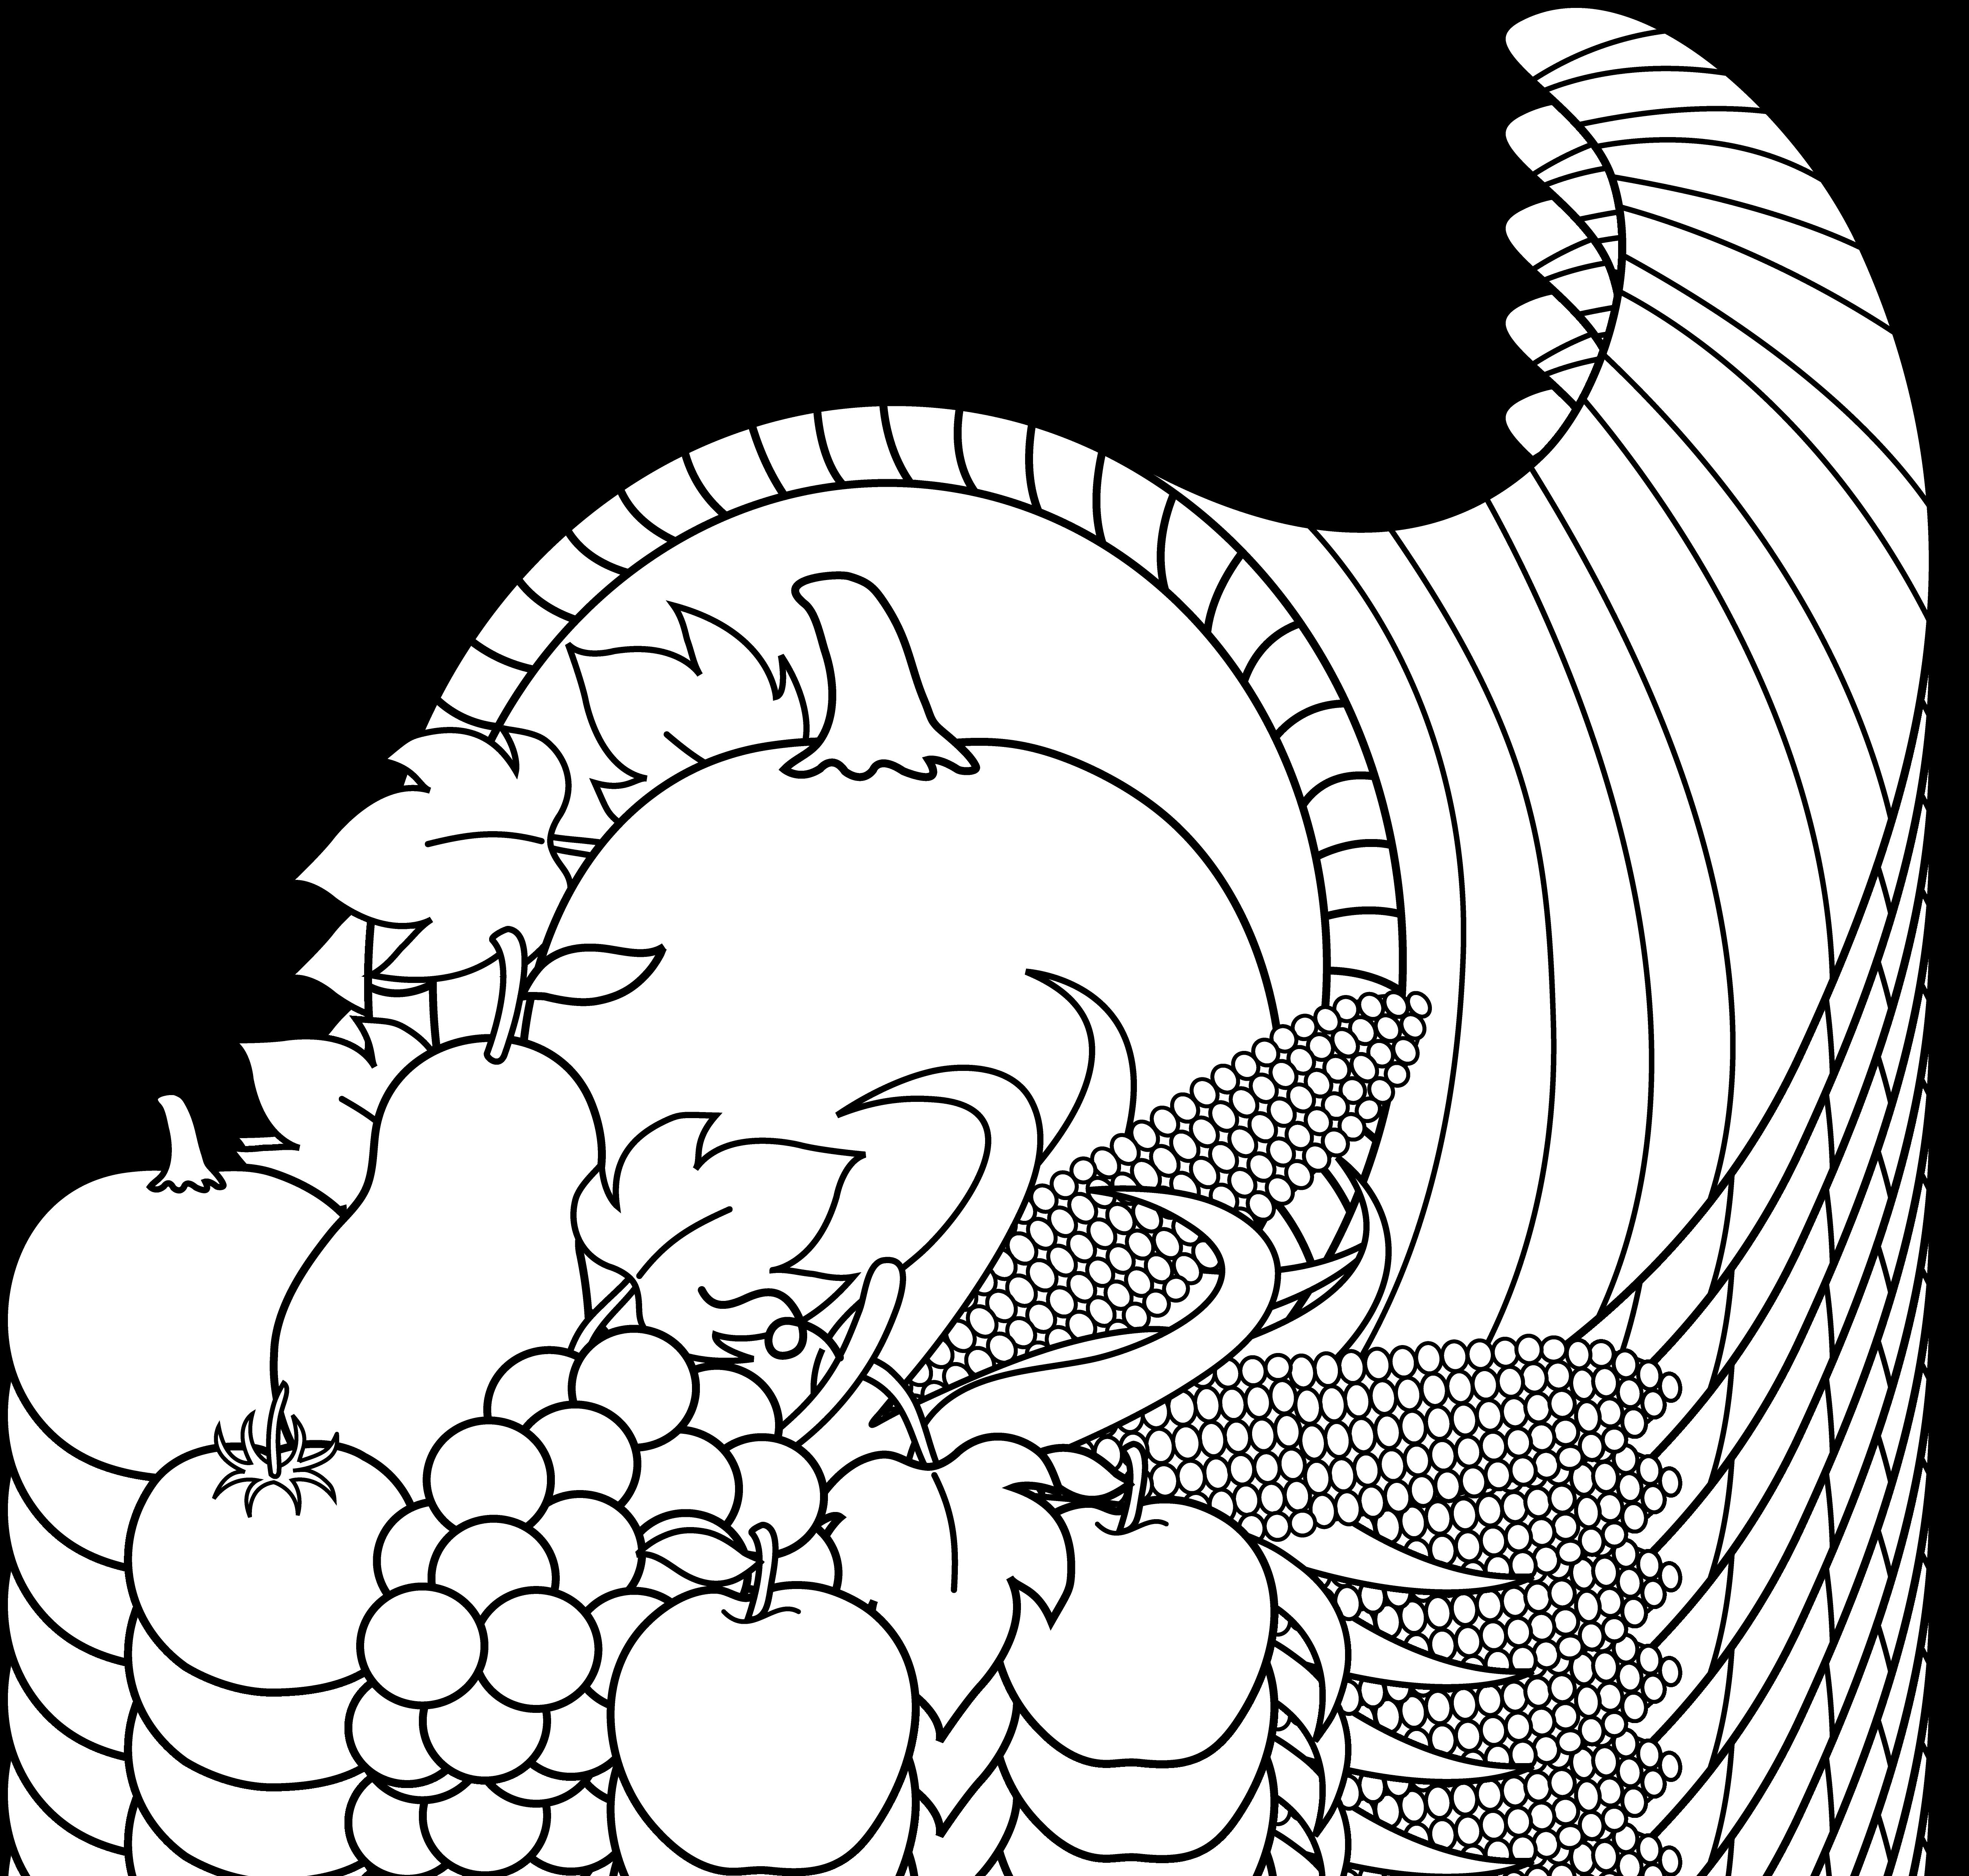 graphic freeuse stock Cornucopia black and white clipart. Harvest line art free